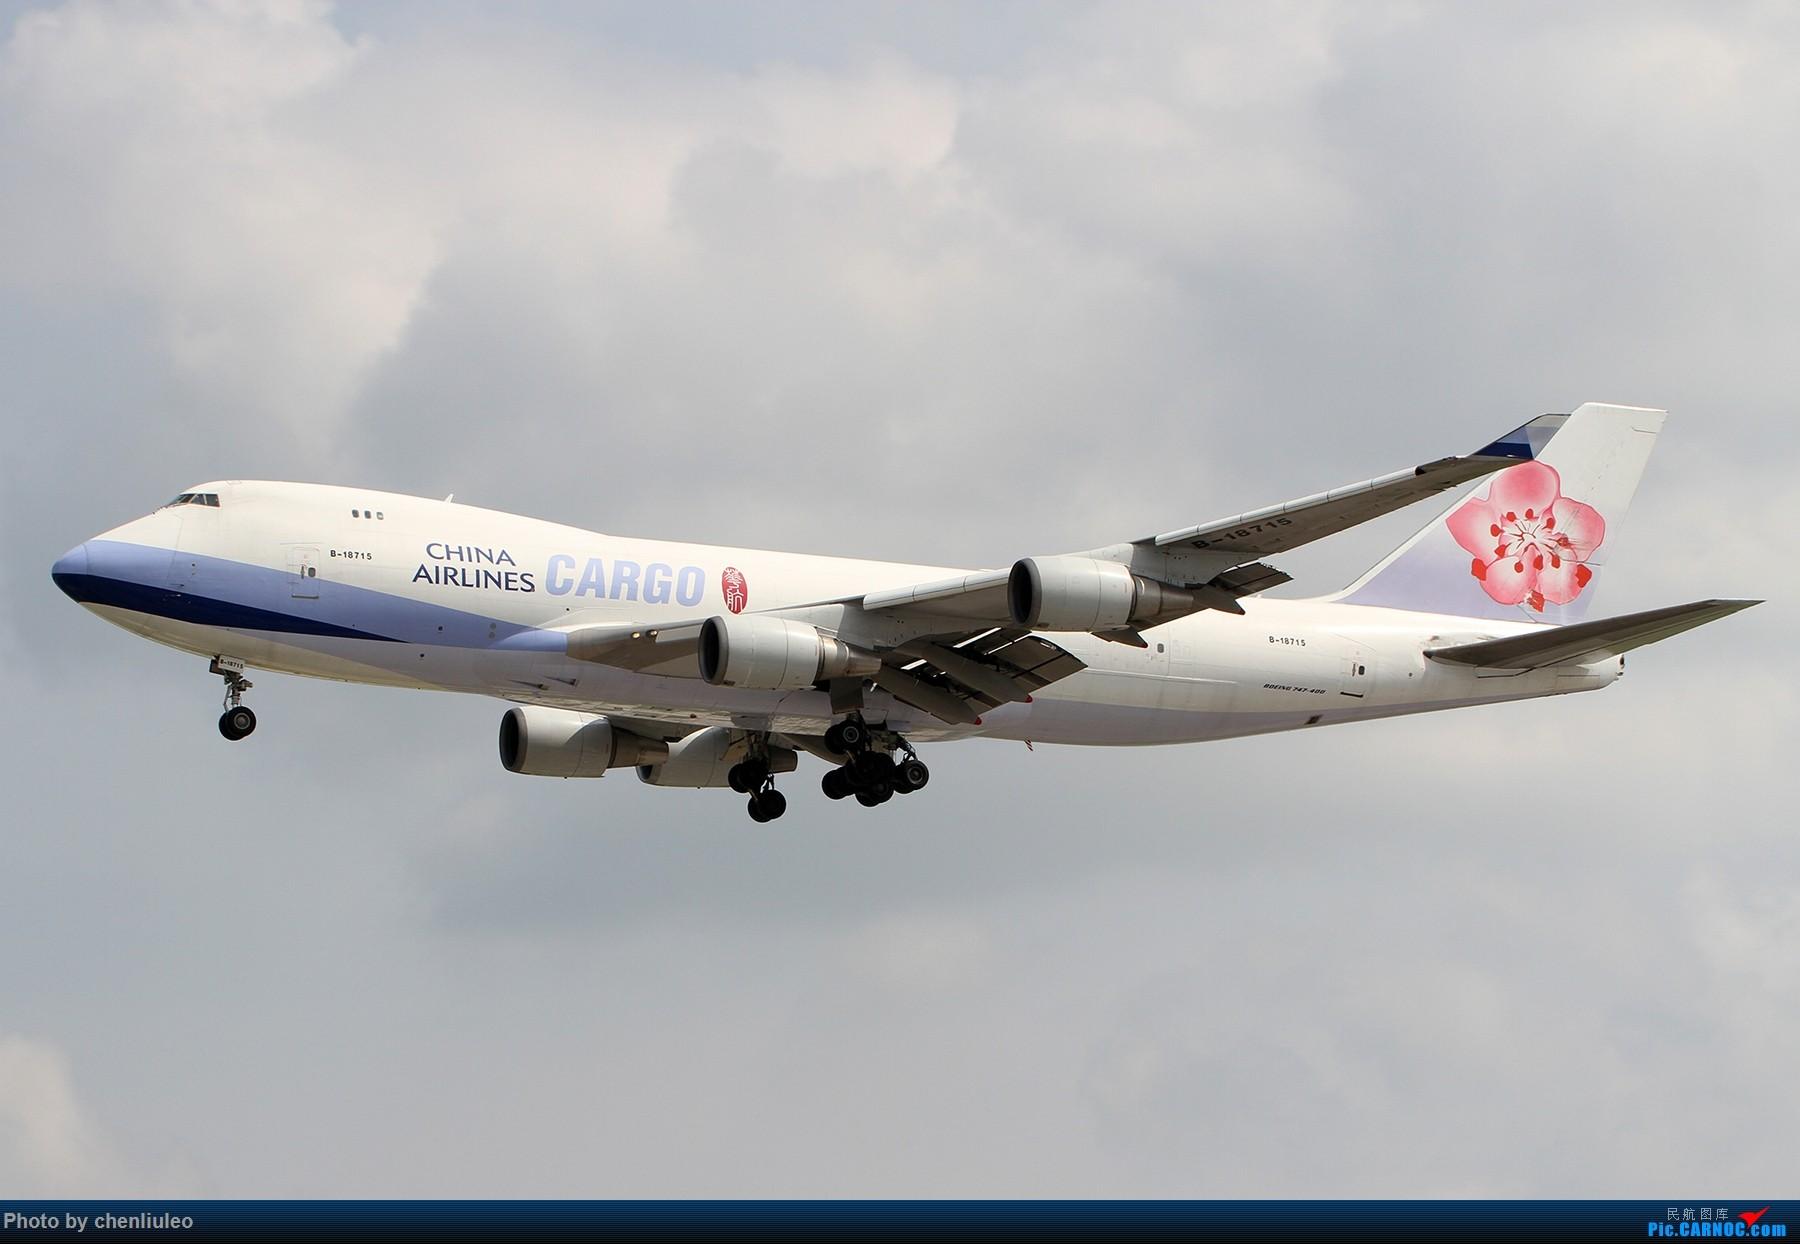 Re:[原创]【北美飞友会】芝加哥奥黑尔机场首拍 BOEING 747-400 B-18715 美国芝加哥奥黑尔国际机场